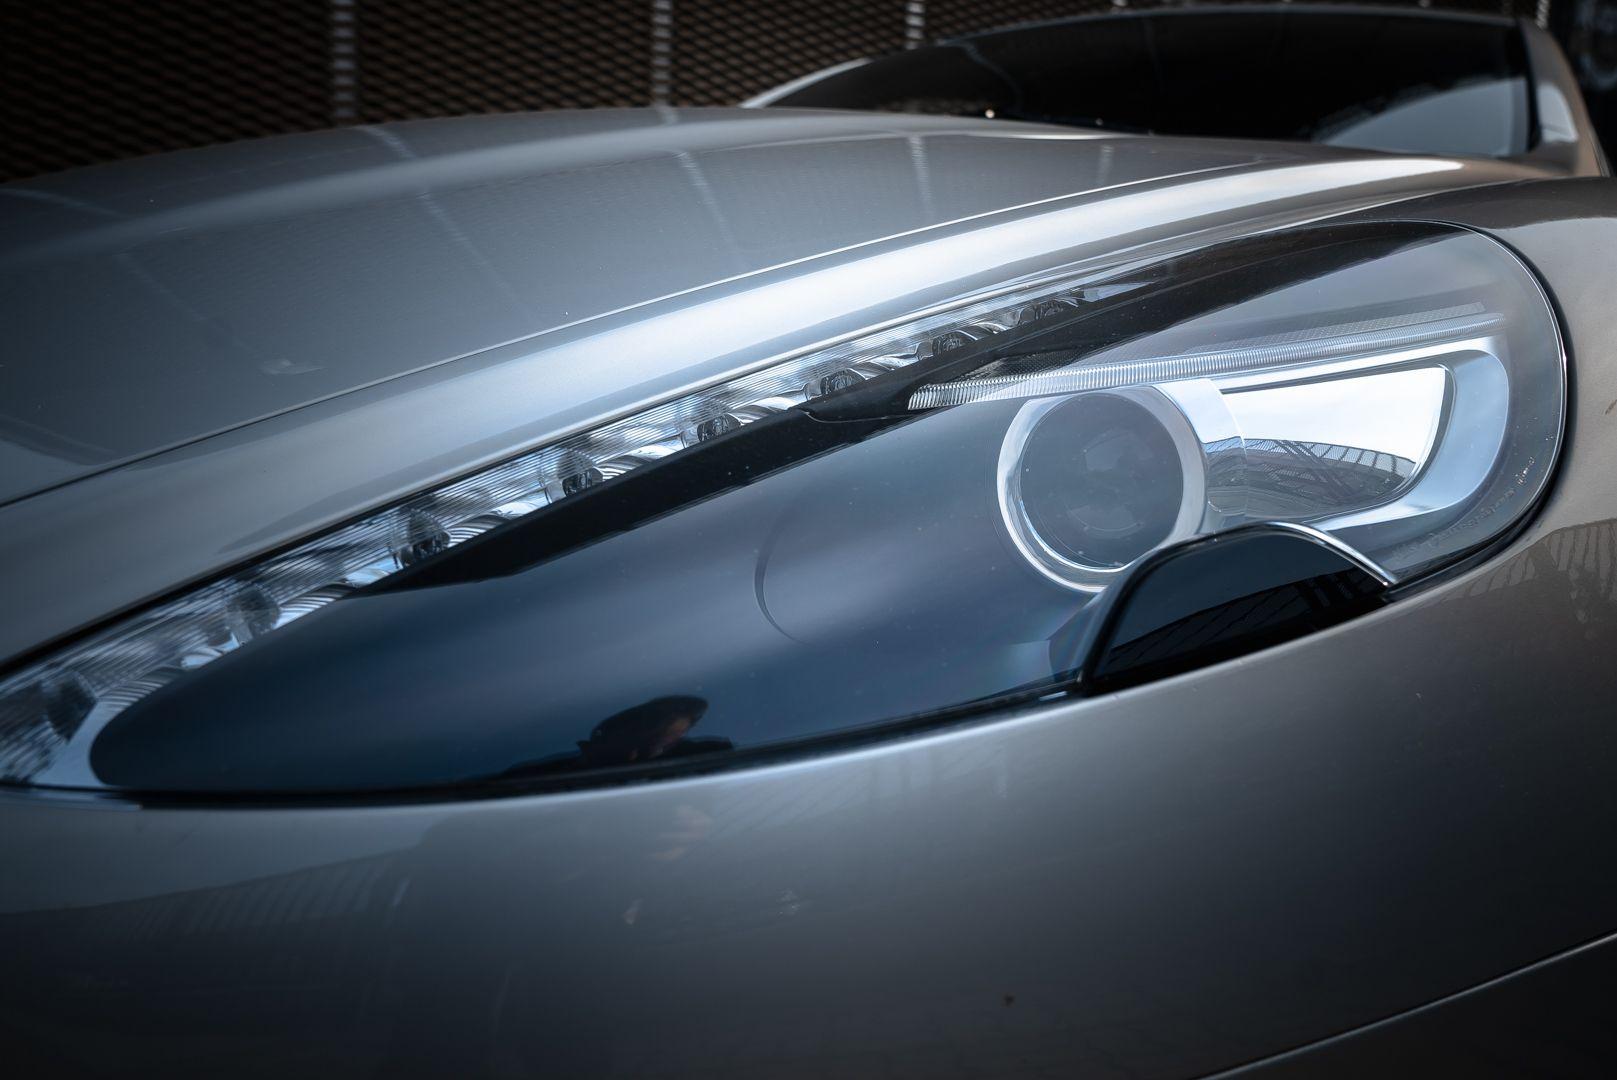 2010 Aston Martin Rapide 6.0 V12 62576